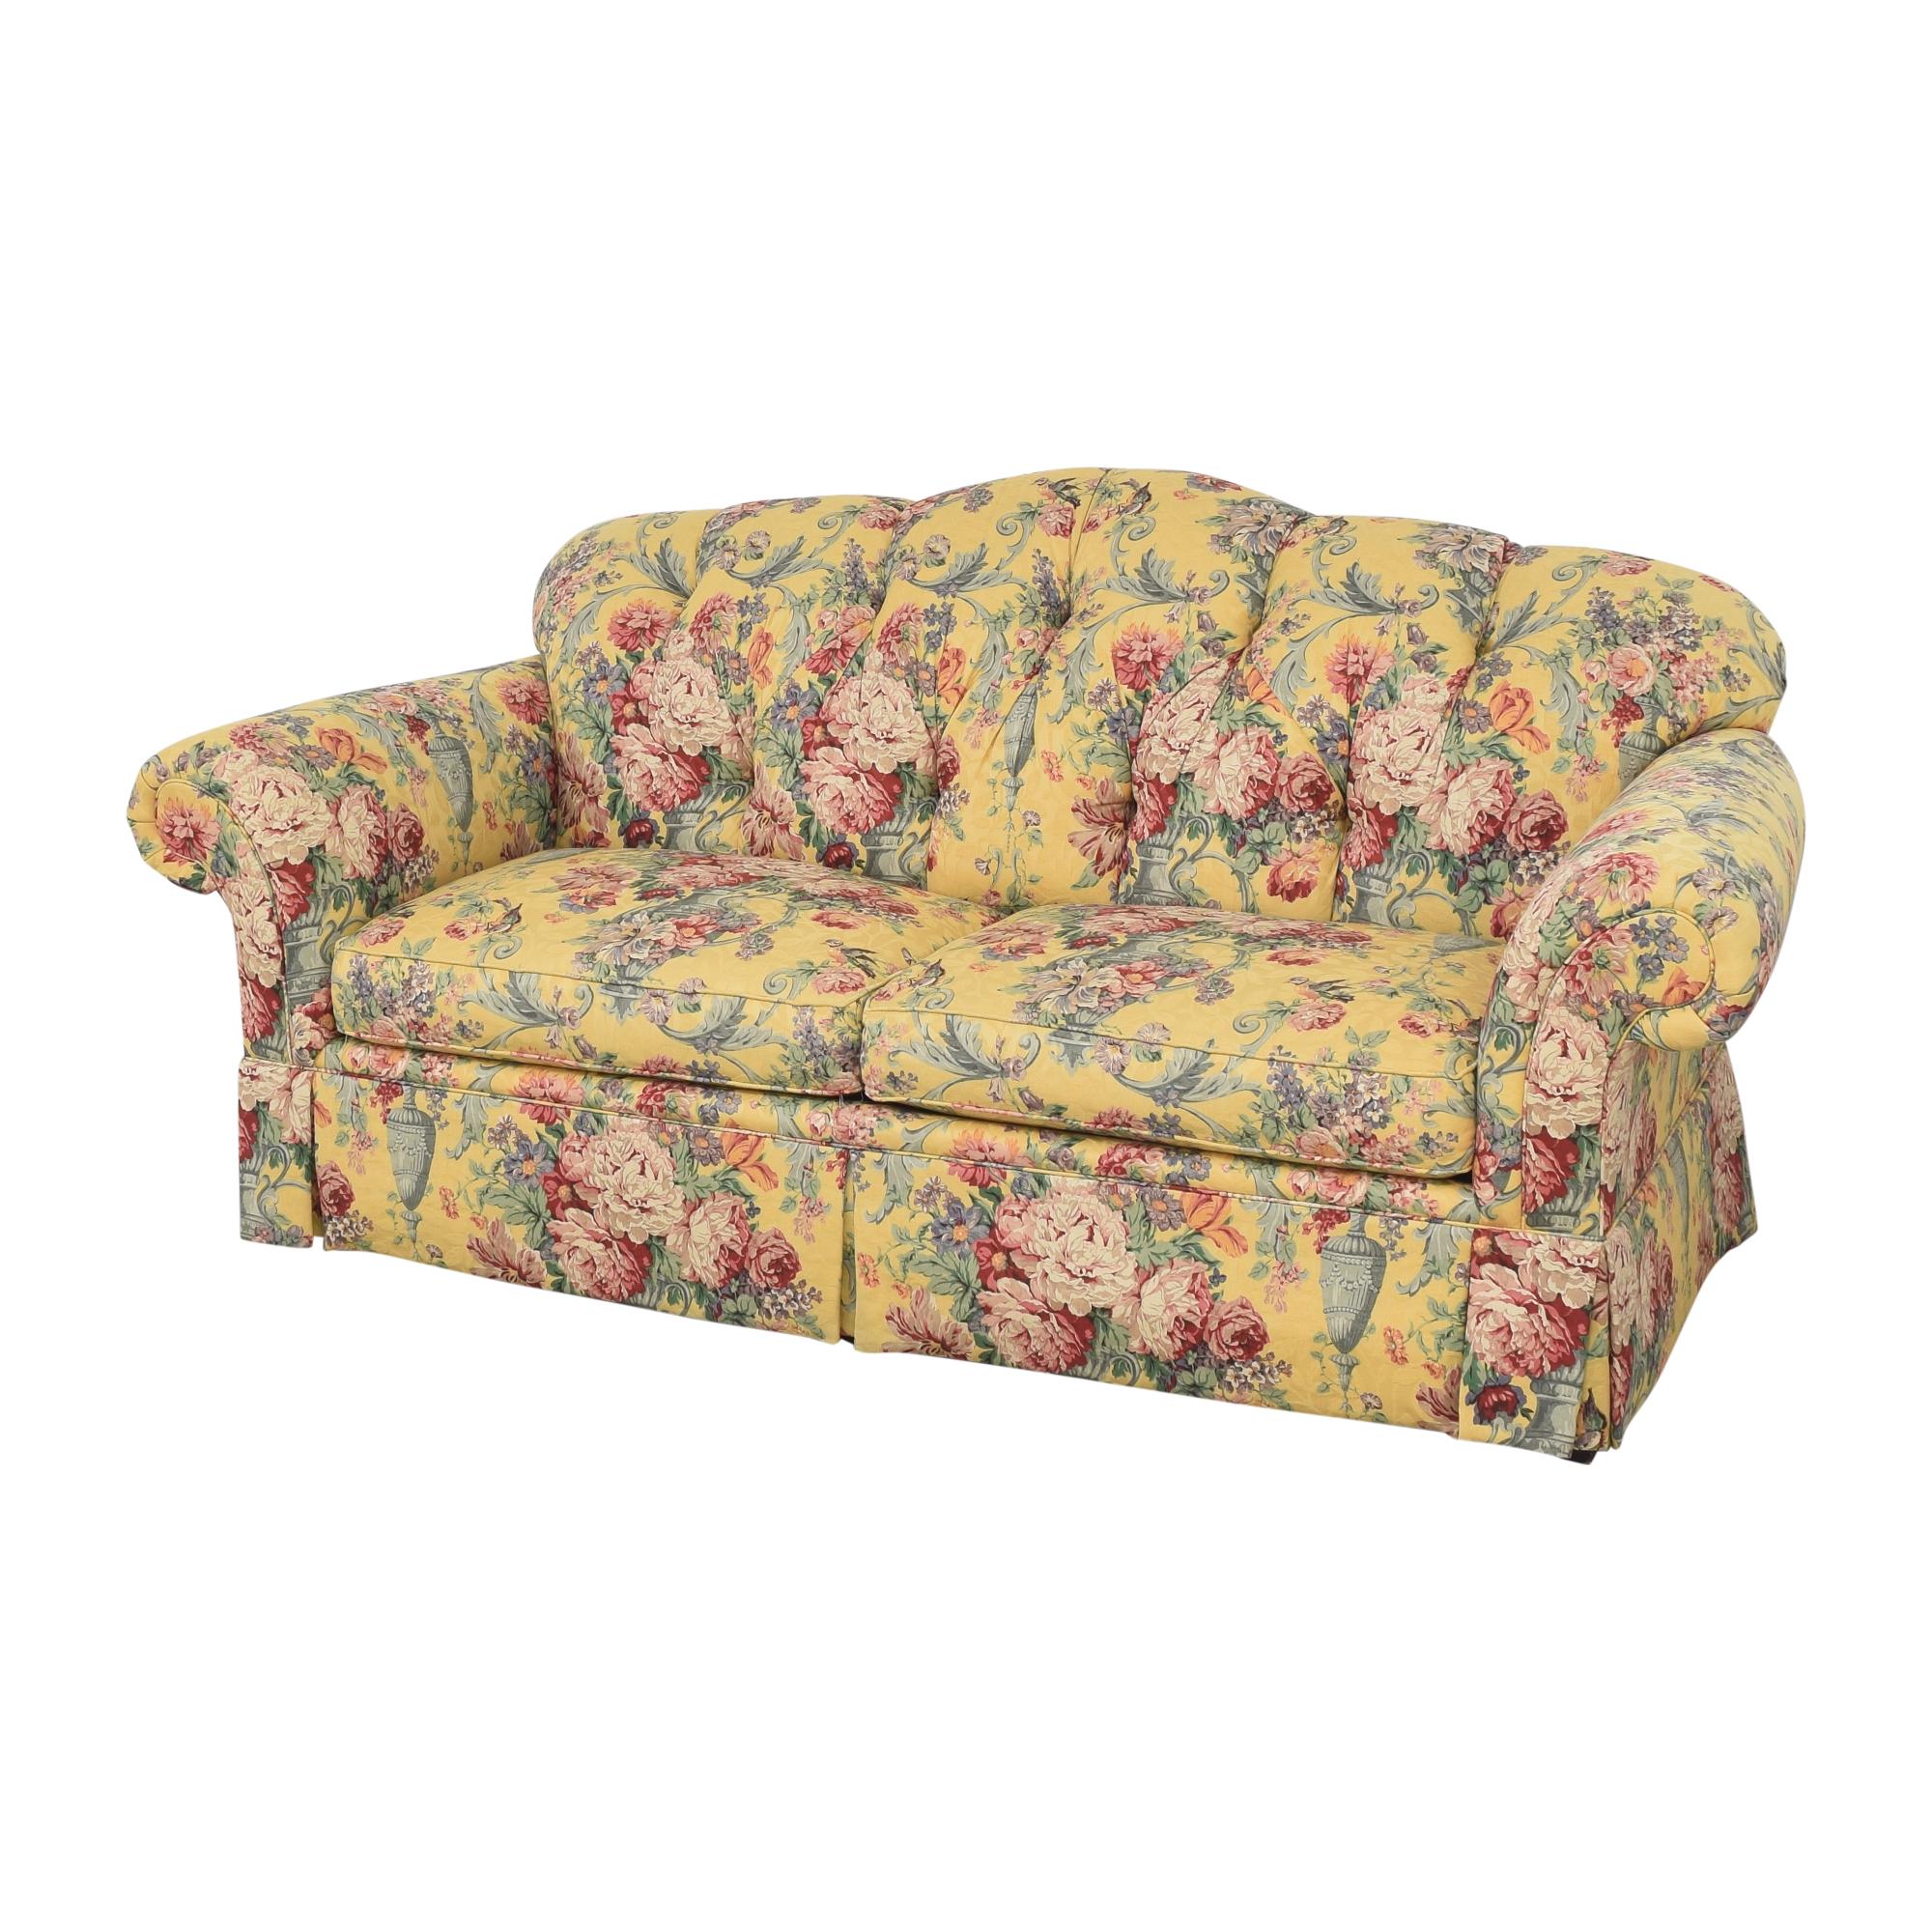 Lexington Furniture Lexington Floral Skirted Sofa second hand